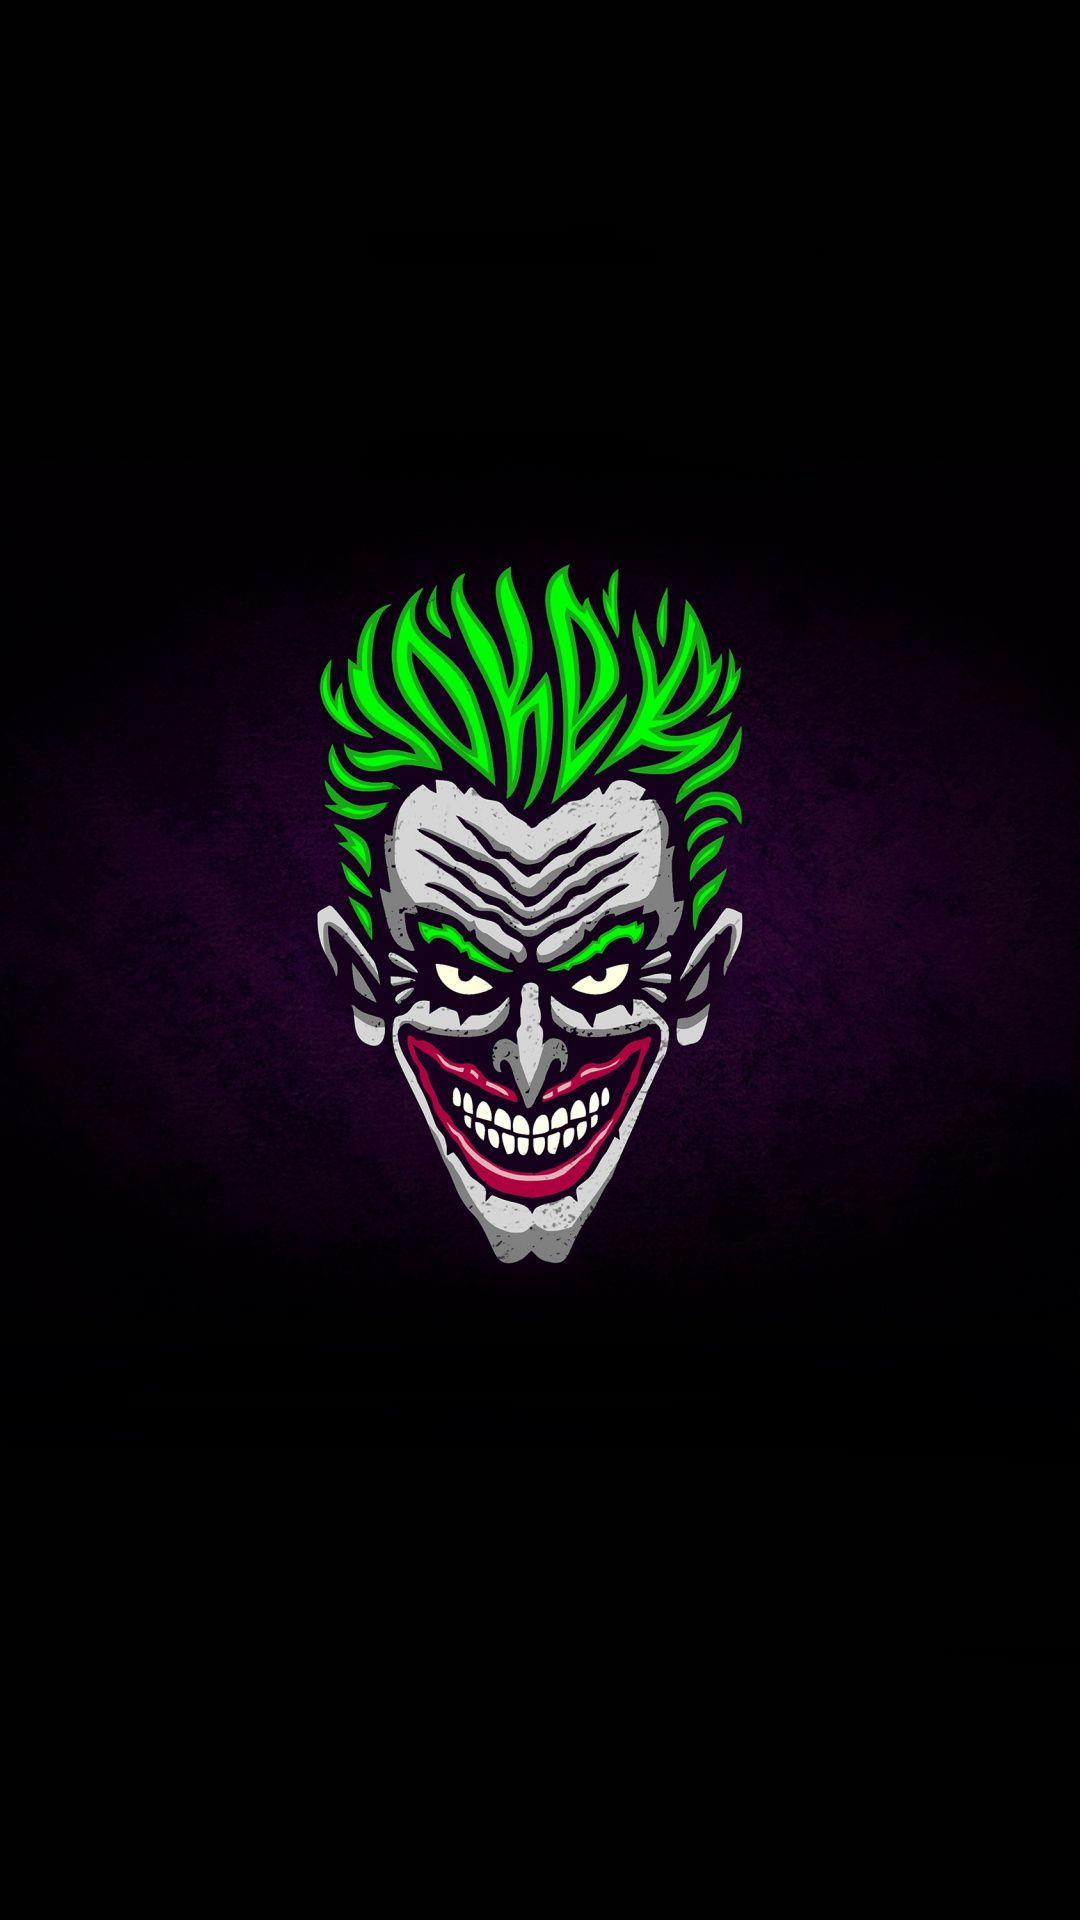 Downaload Joker S Face Villain Minimal Wallpaper For Screen 1080x1920 Samsung Galaxy S4 S5 Note Sony Xperi Joker Face Joker Hd Wallpaper Joker Wallpapers